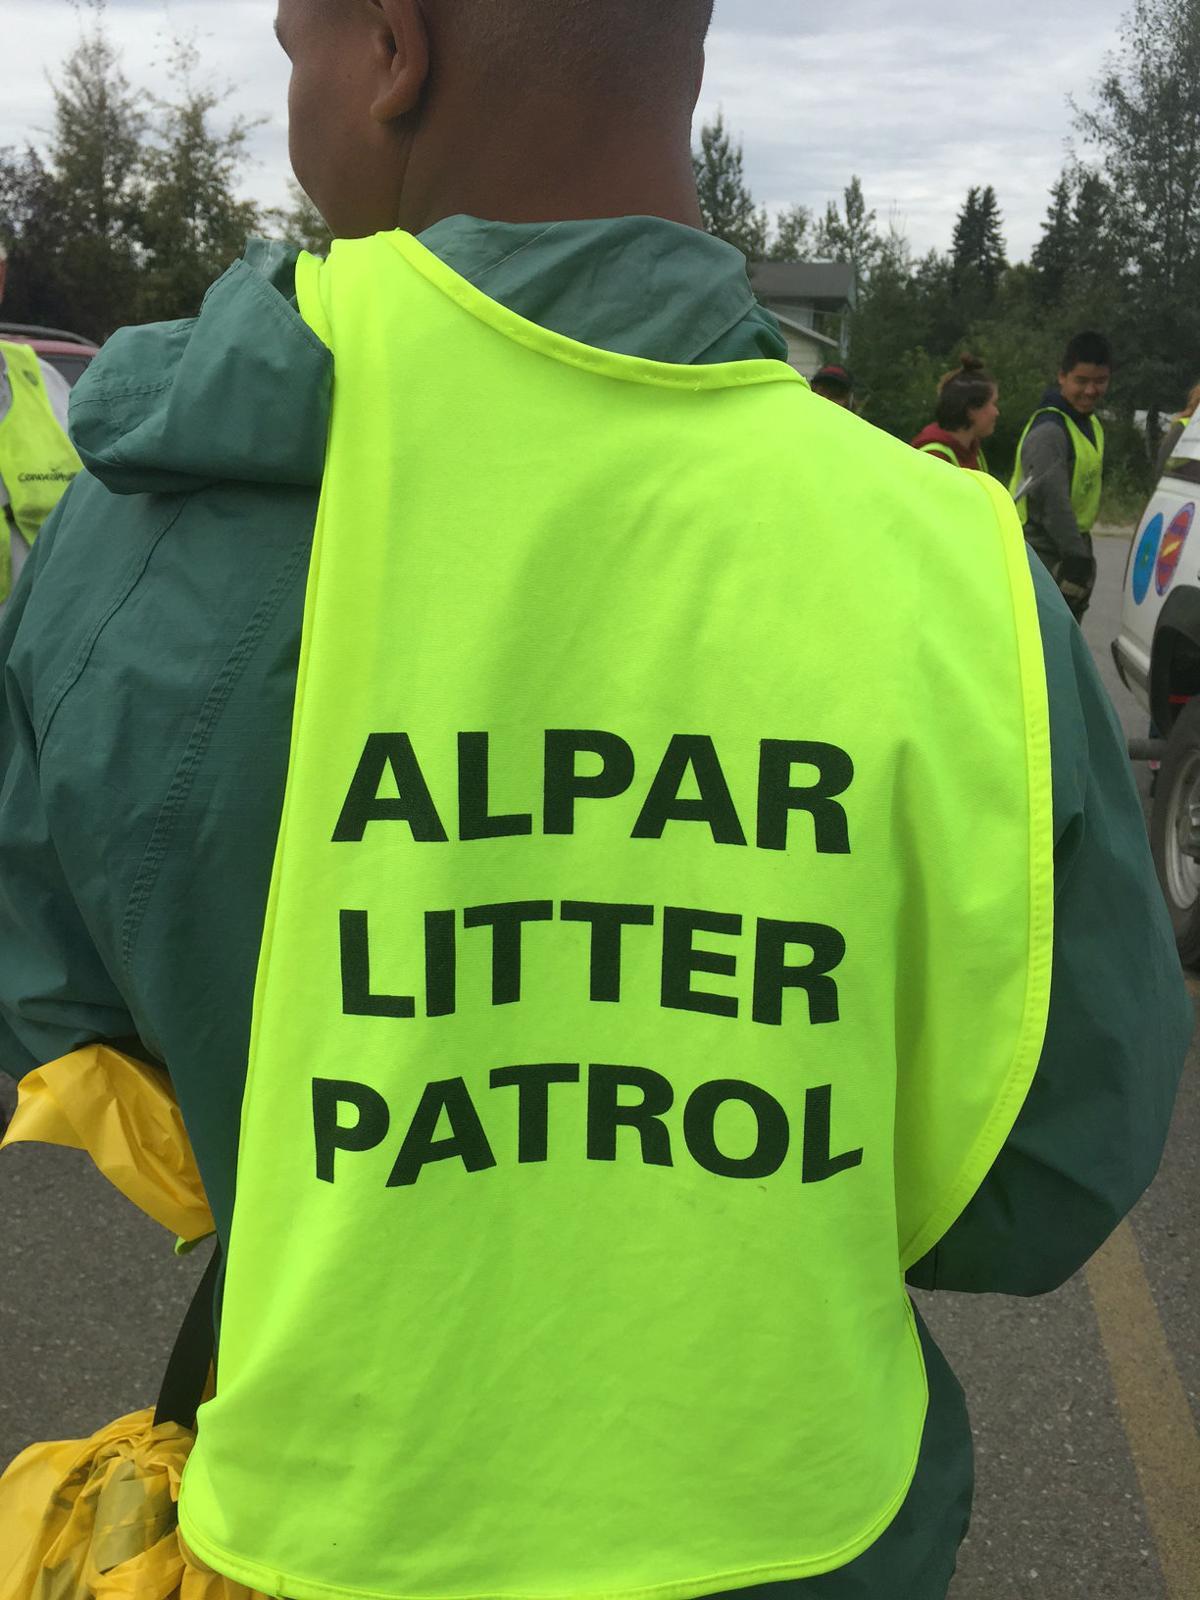 Litter patrol vest